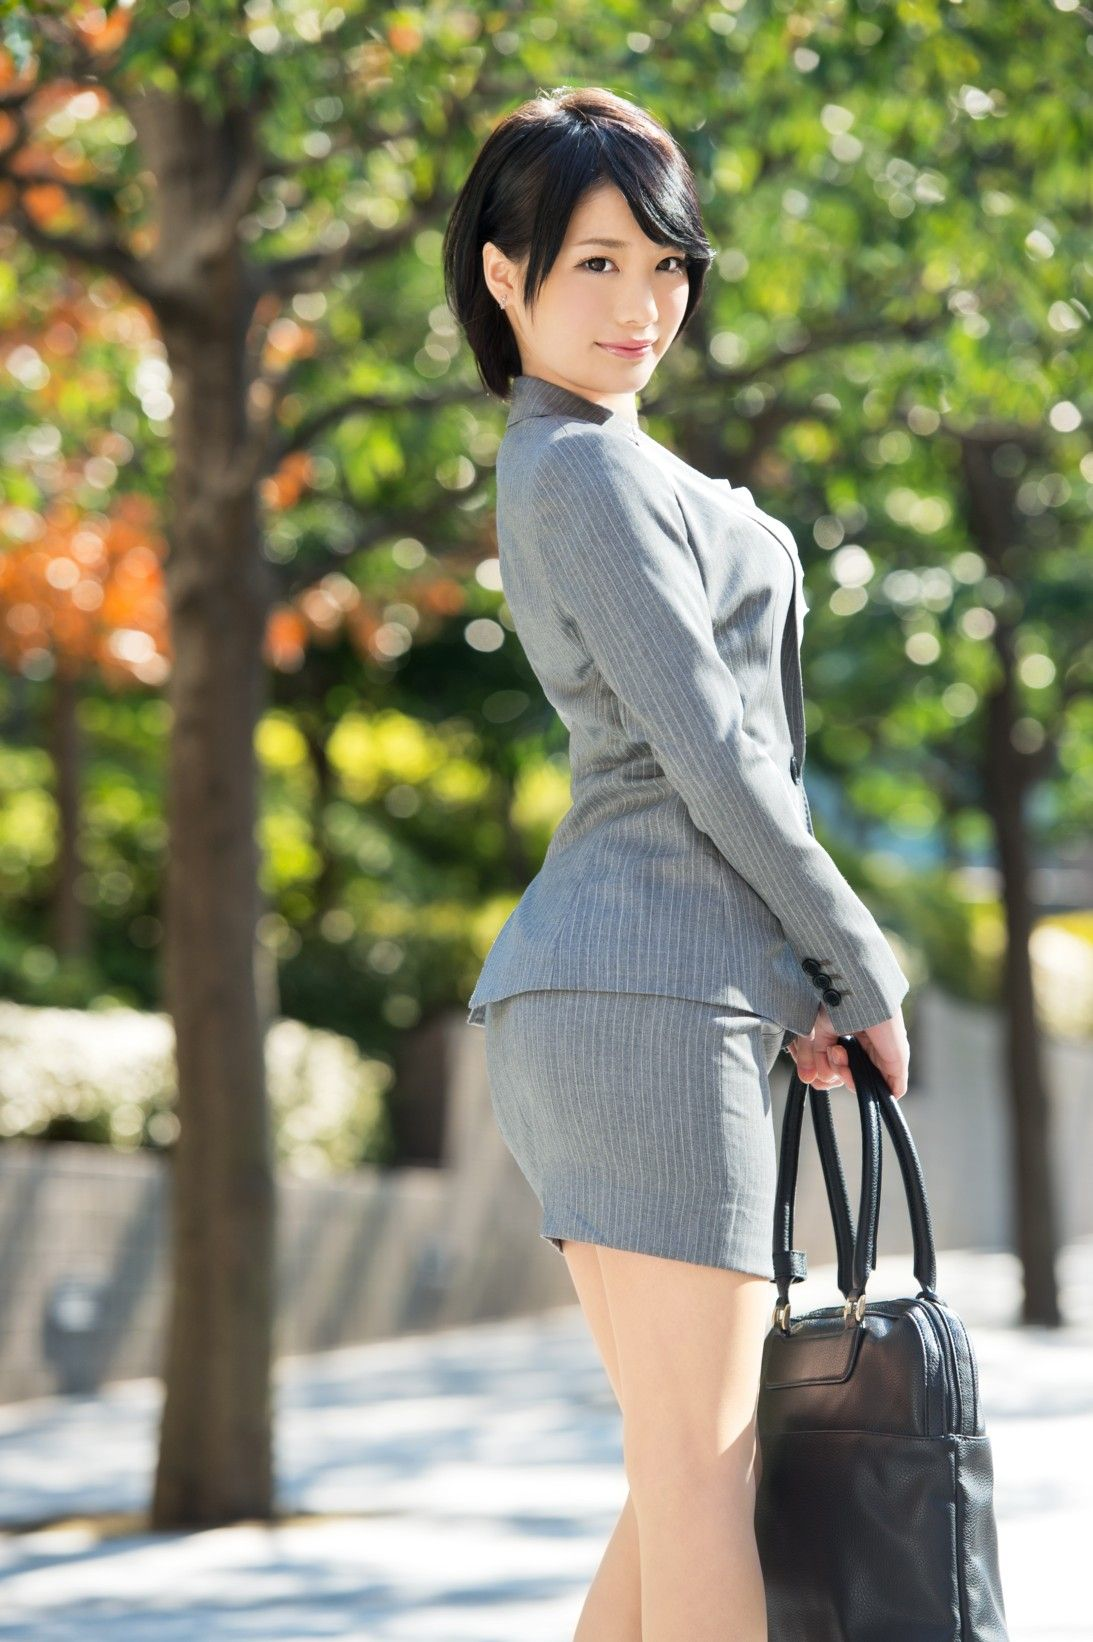 Japan tight girl, mature porn youtube